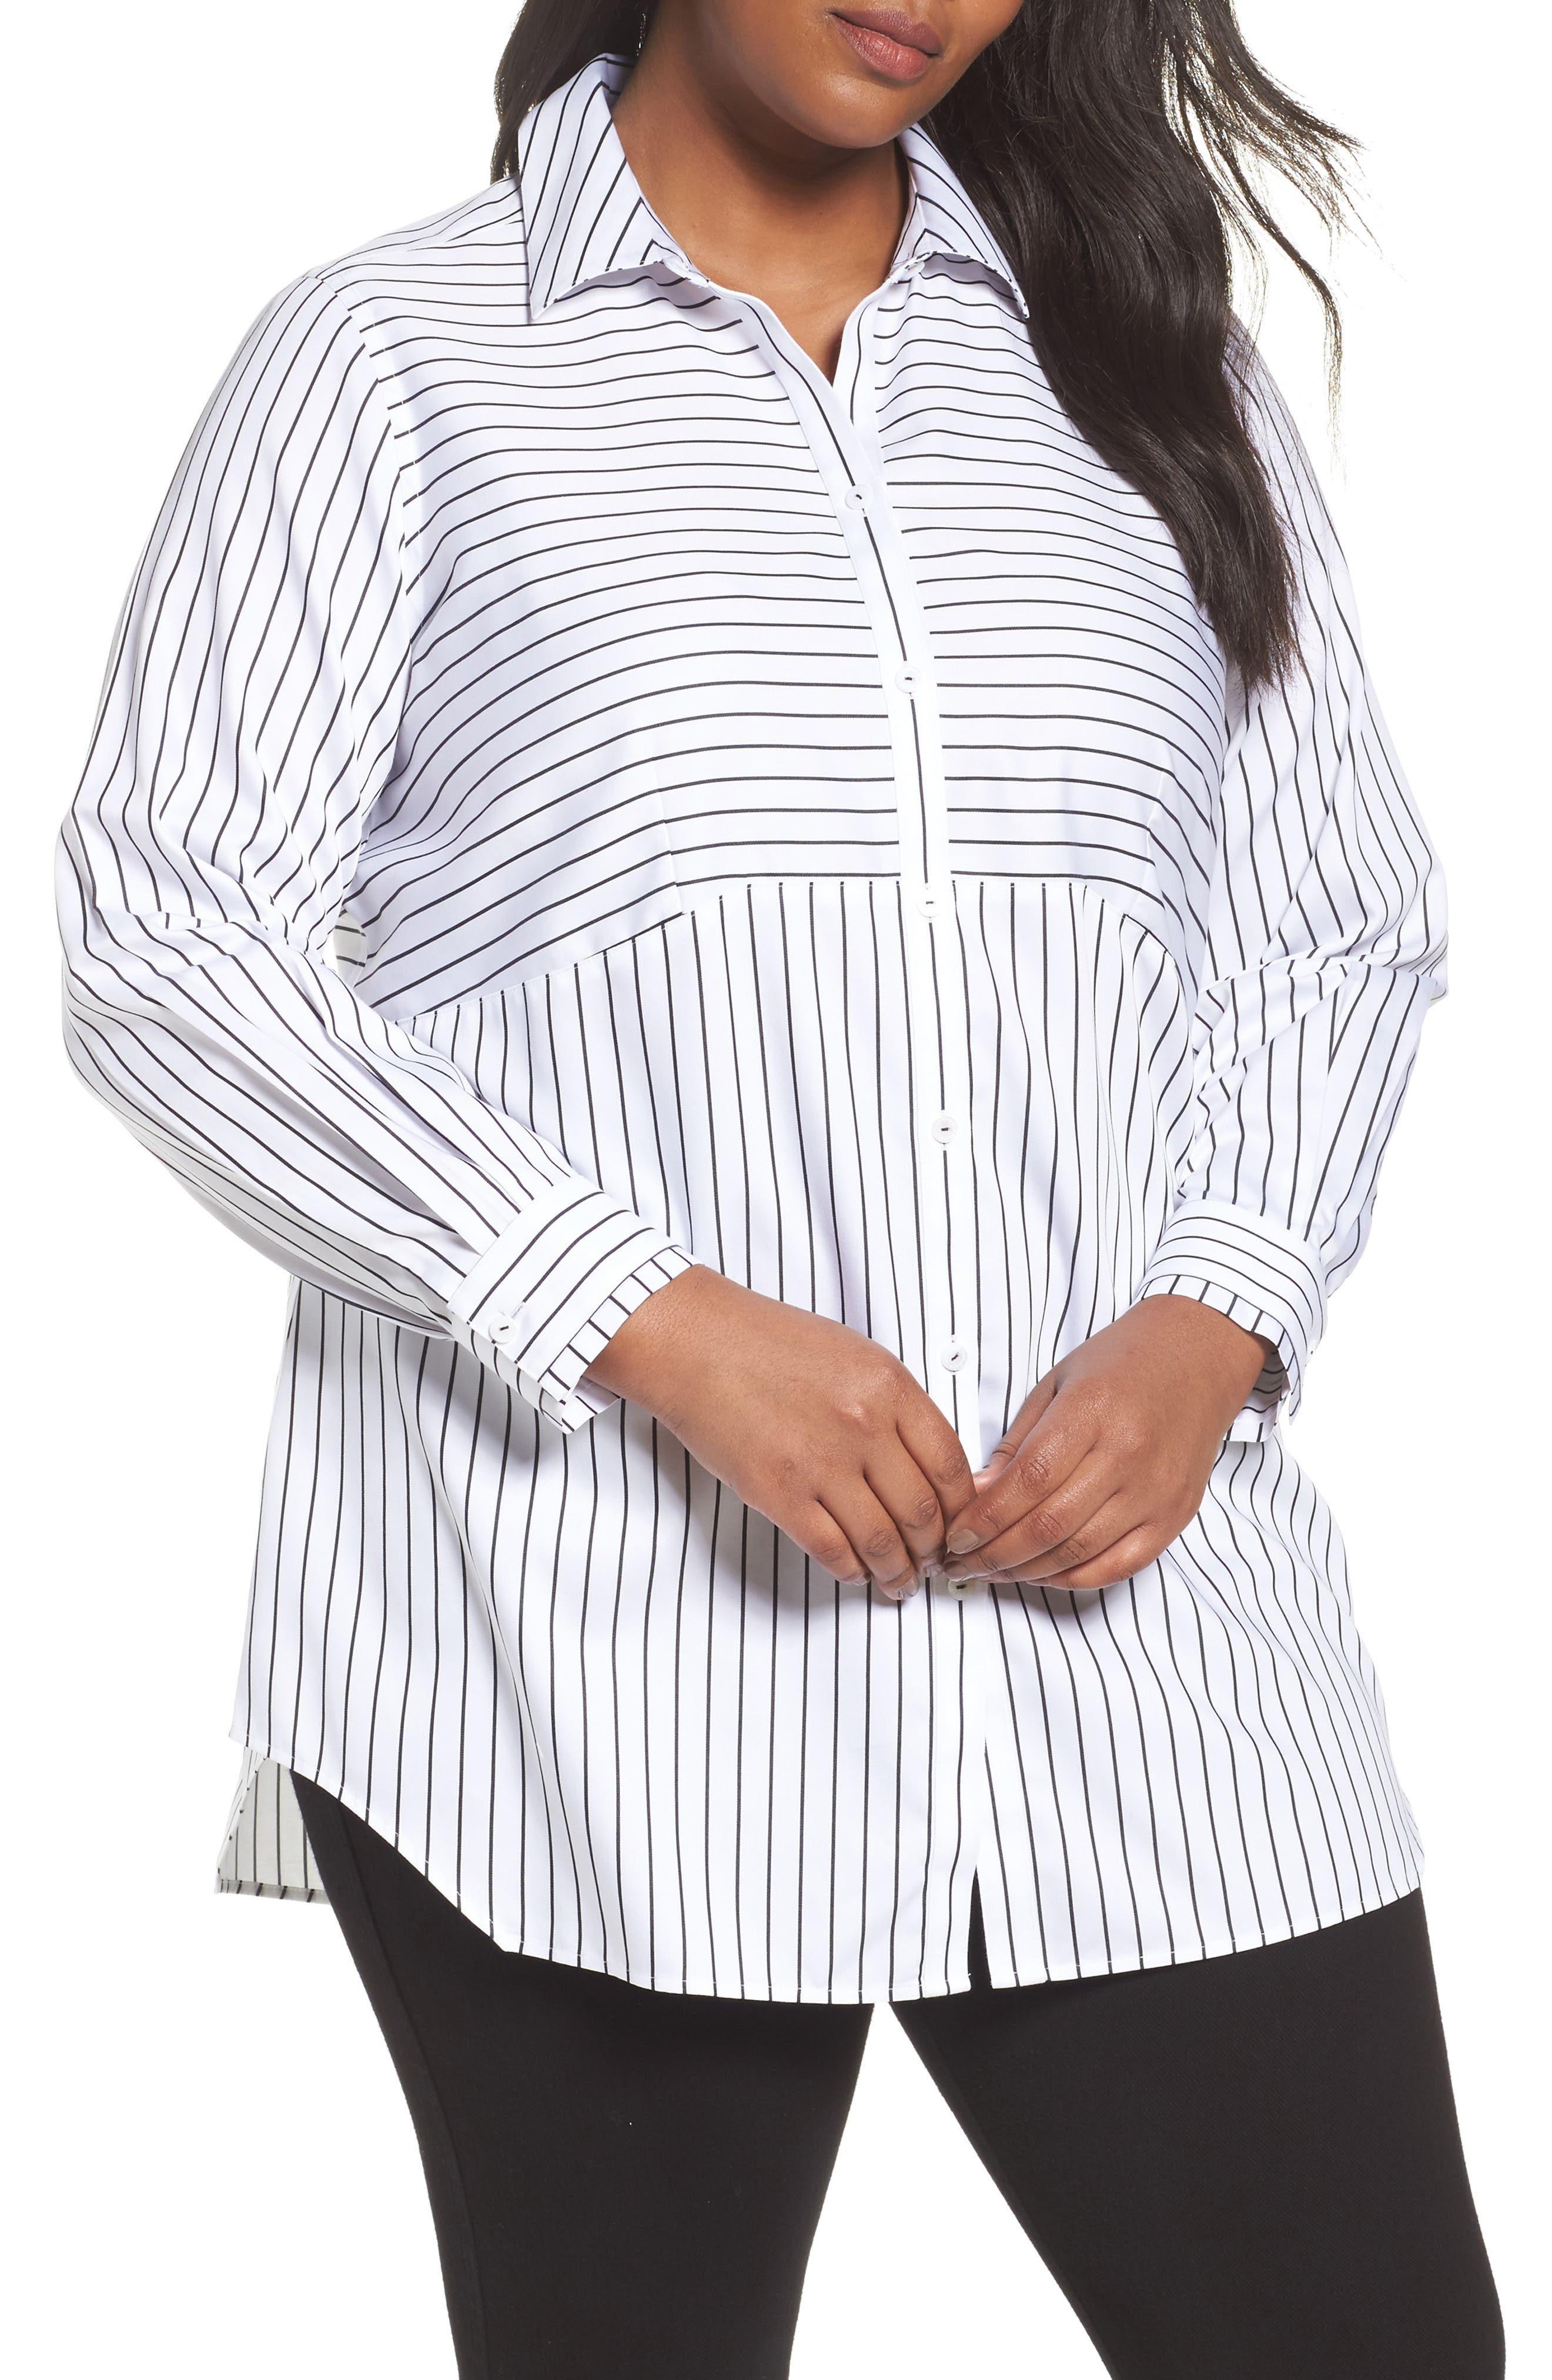 Gina Holiday Stripe Shirt,                         Main,                         color, White